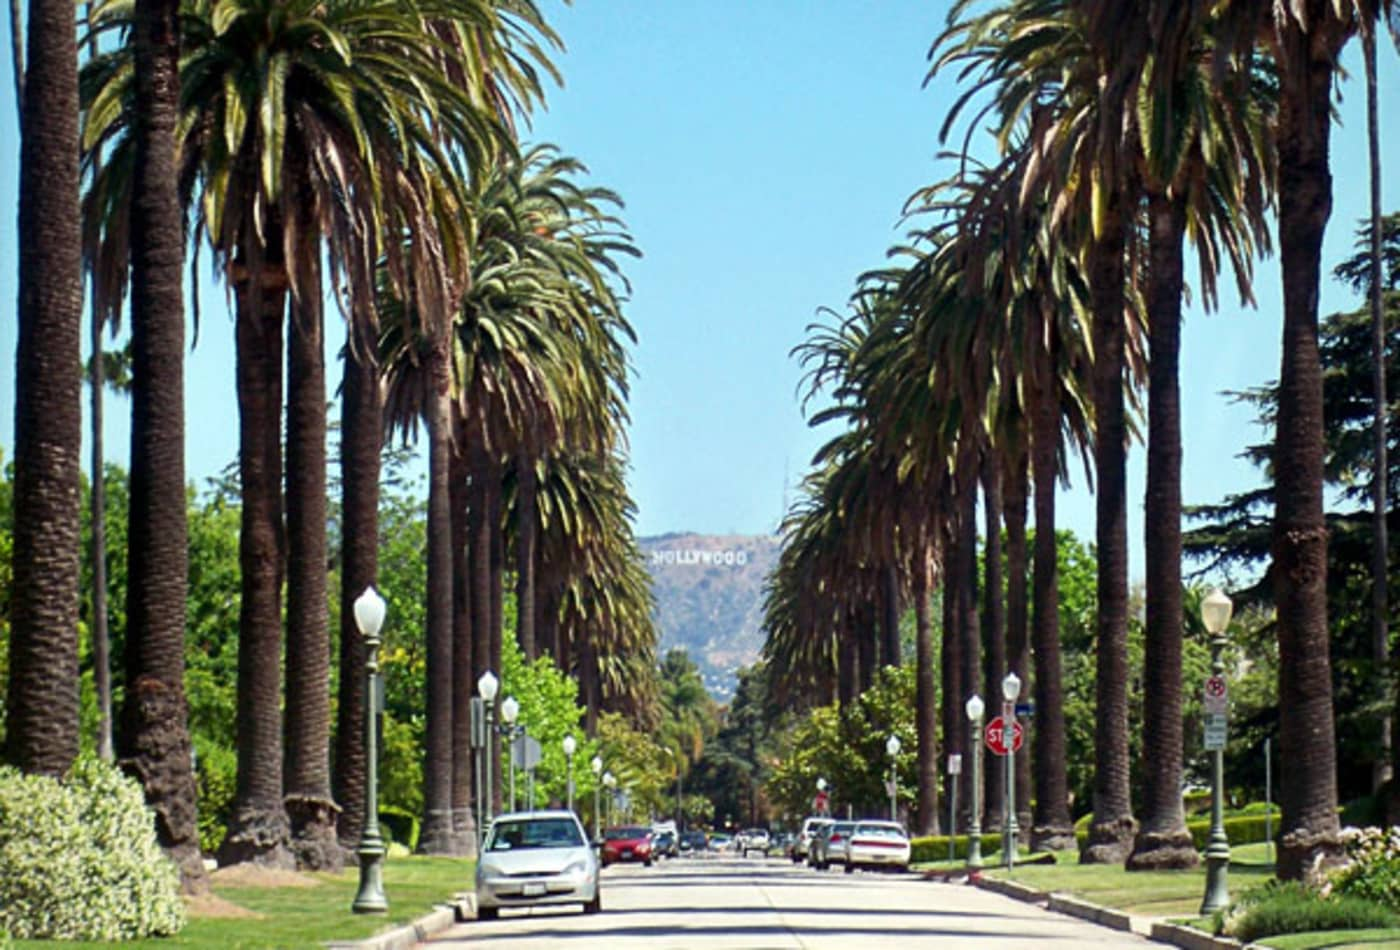 Hancock-Park-Los-Angeles-Best-Kept-Secret-Neighborhoods-CNBC.jpg